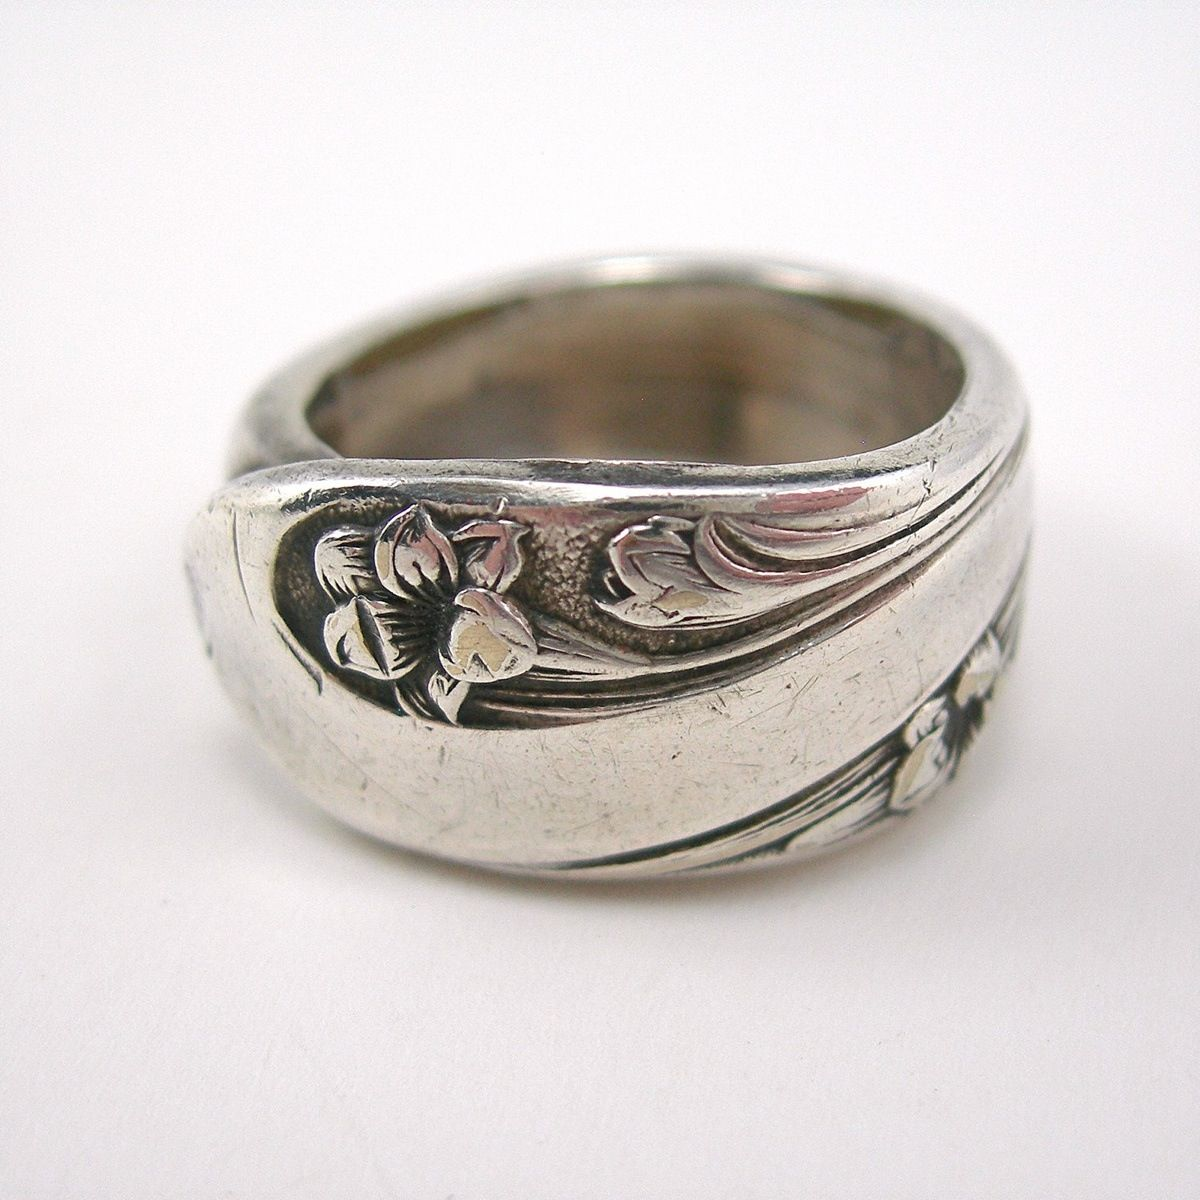 spoon ring jewelry i